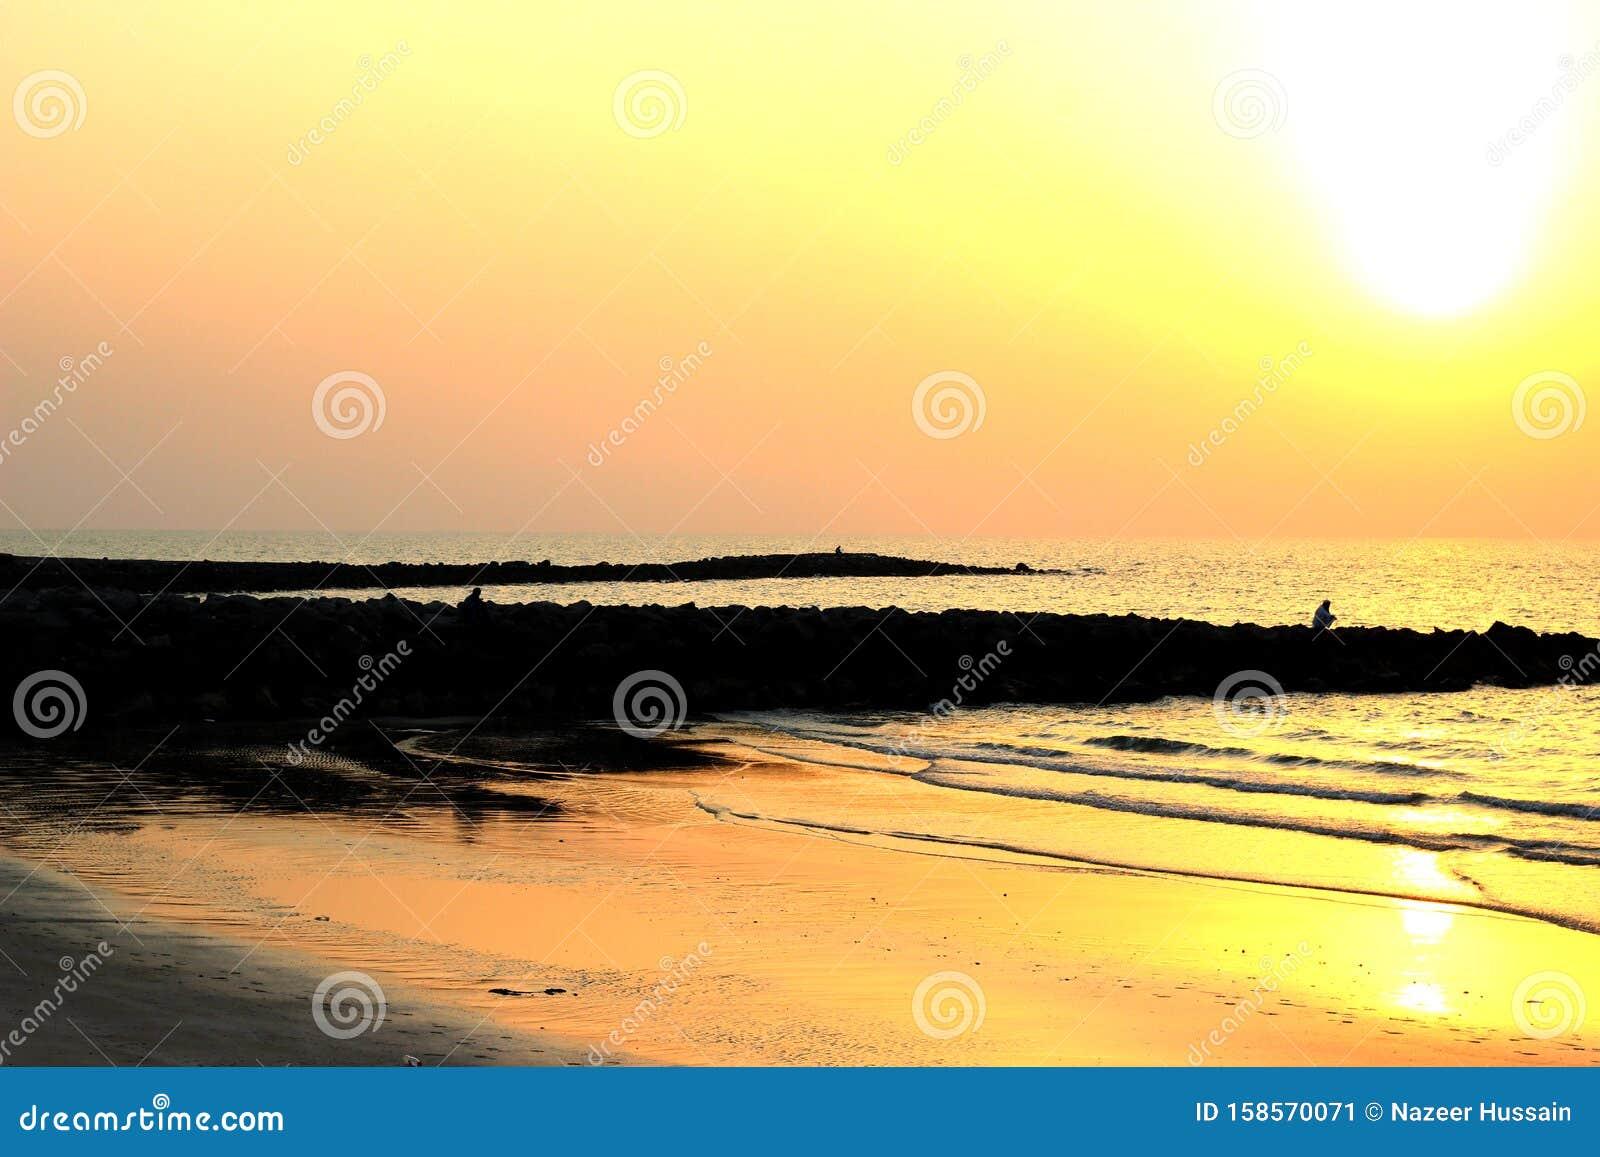 colorful ocean beach sunrise wallpaper backgrounds sunset ocean wallpaper backgrounds view 158570071